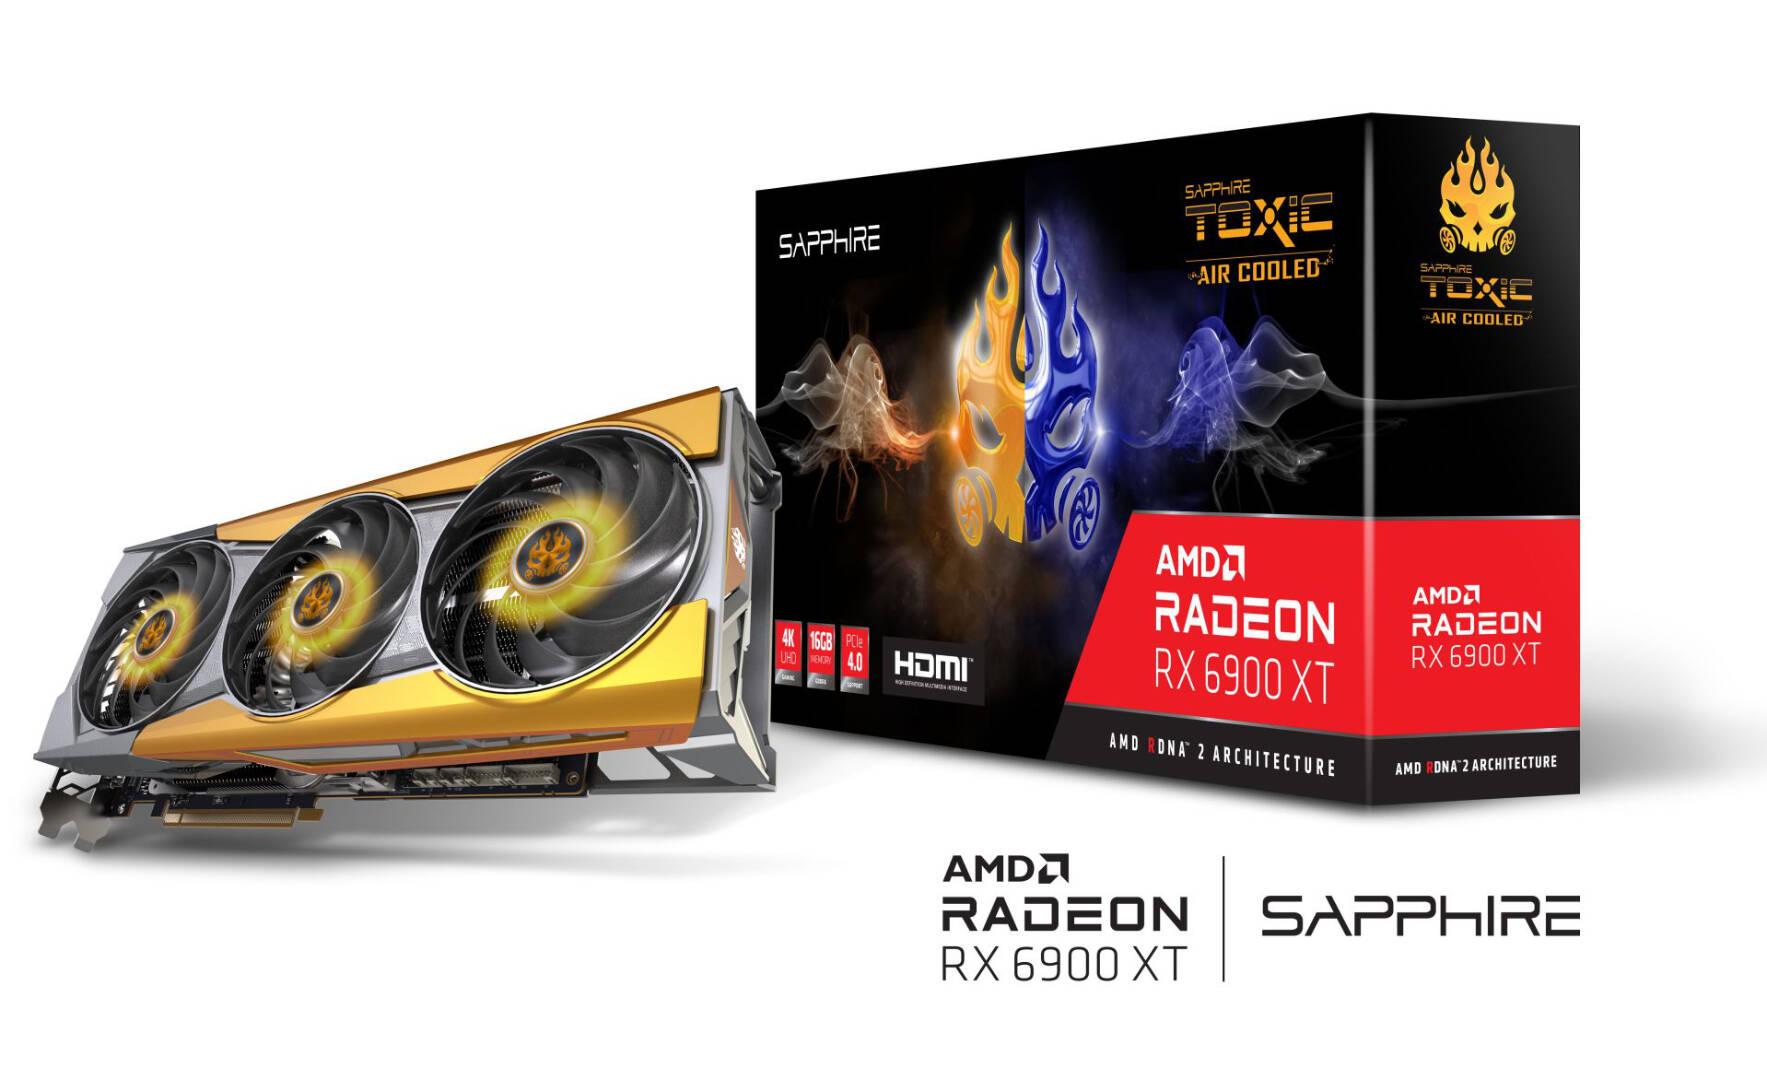 Sapphire Toxic AMD Radeon RX 6900 XT Air Cooled